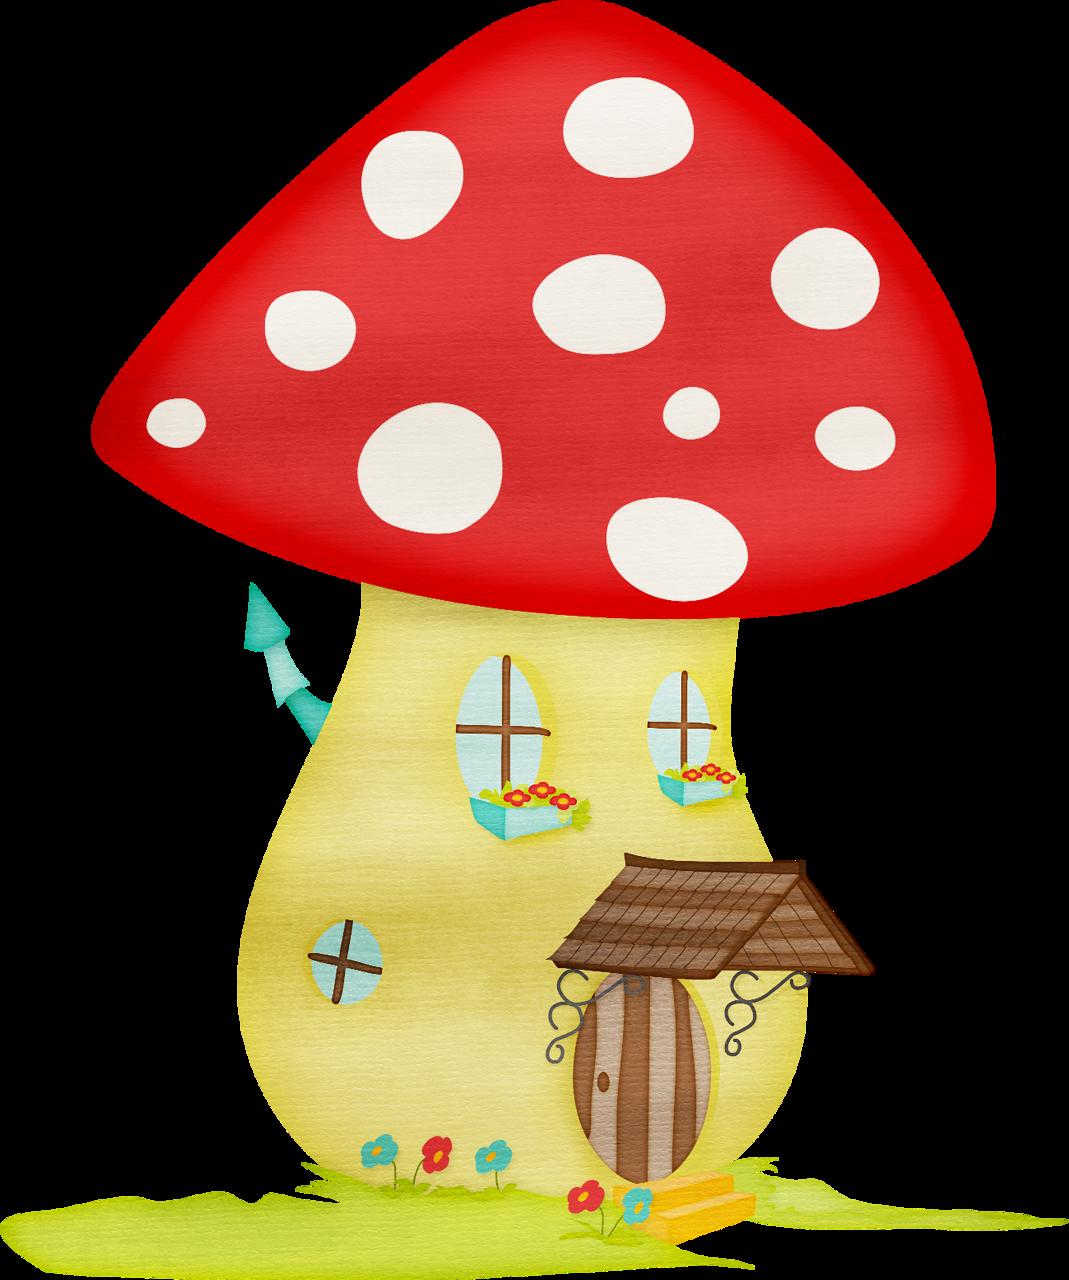 Digilicious gardenofplenty mushroom png. Mushrooms clipart whimsical